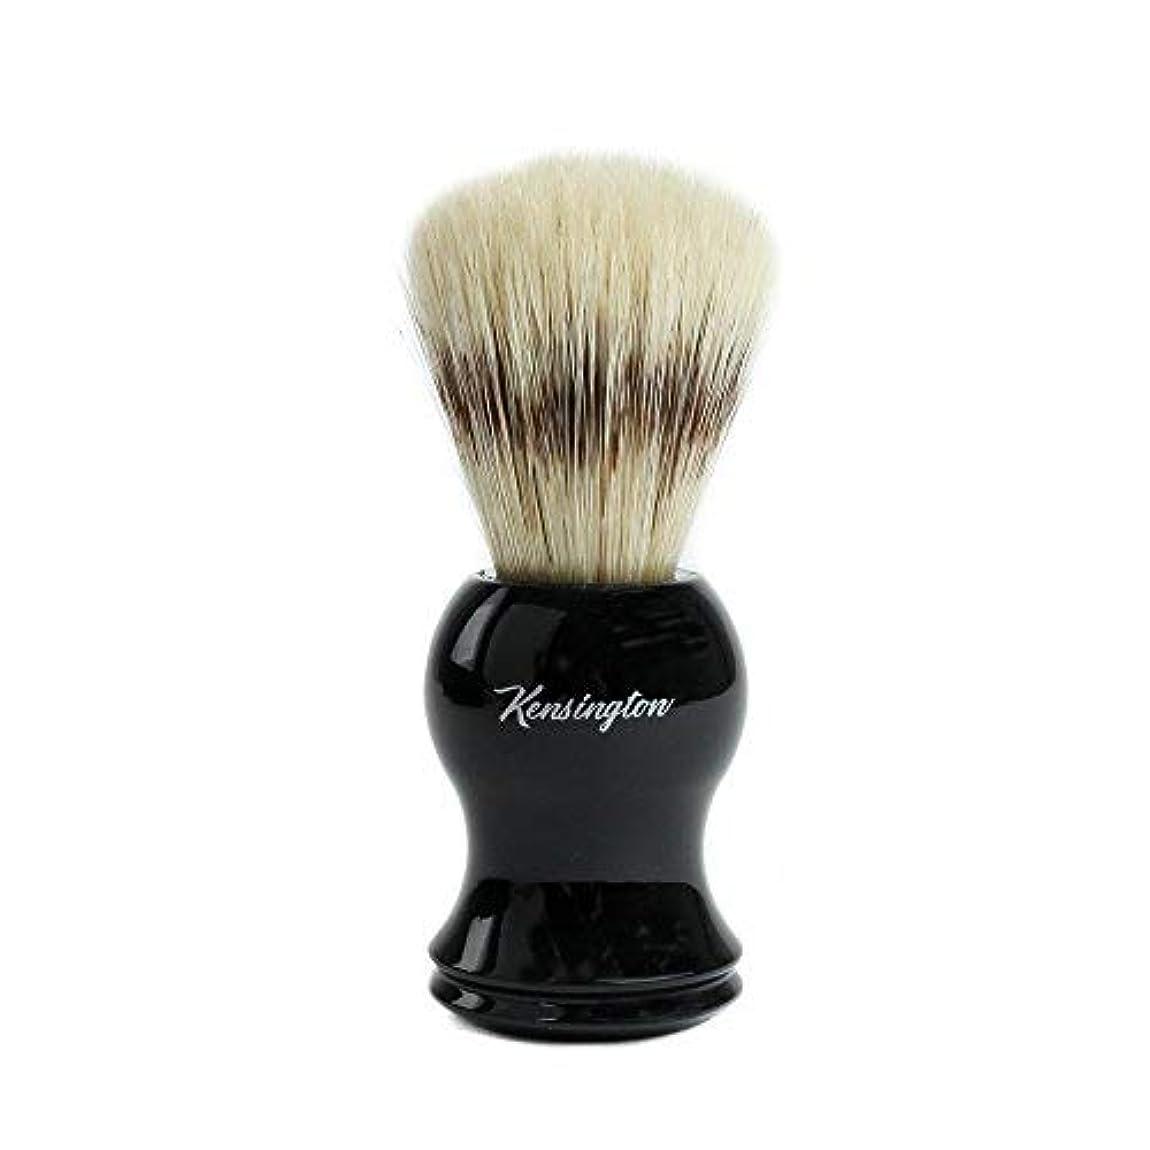 Kensington Boar Bristle Classic Wet Shaving Brush with Stand [並行輸入品]